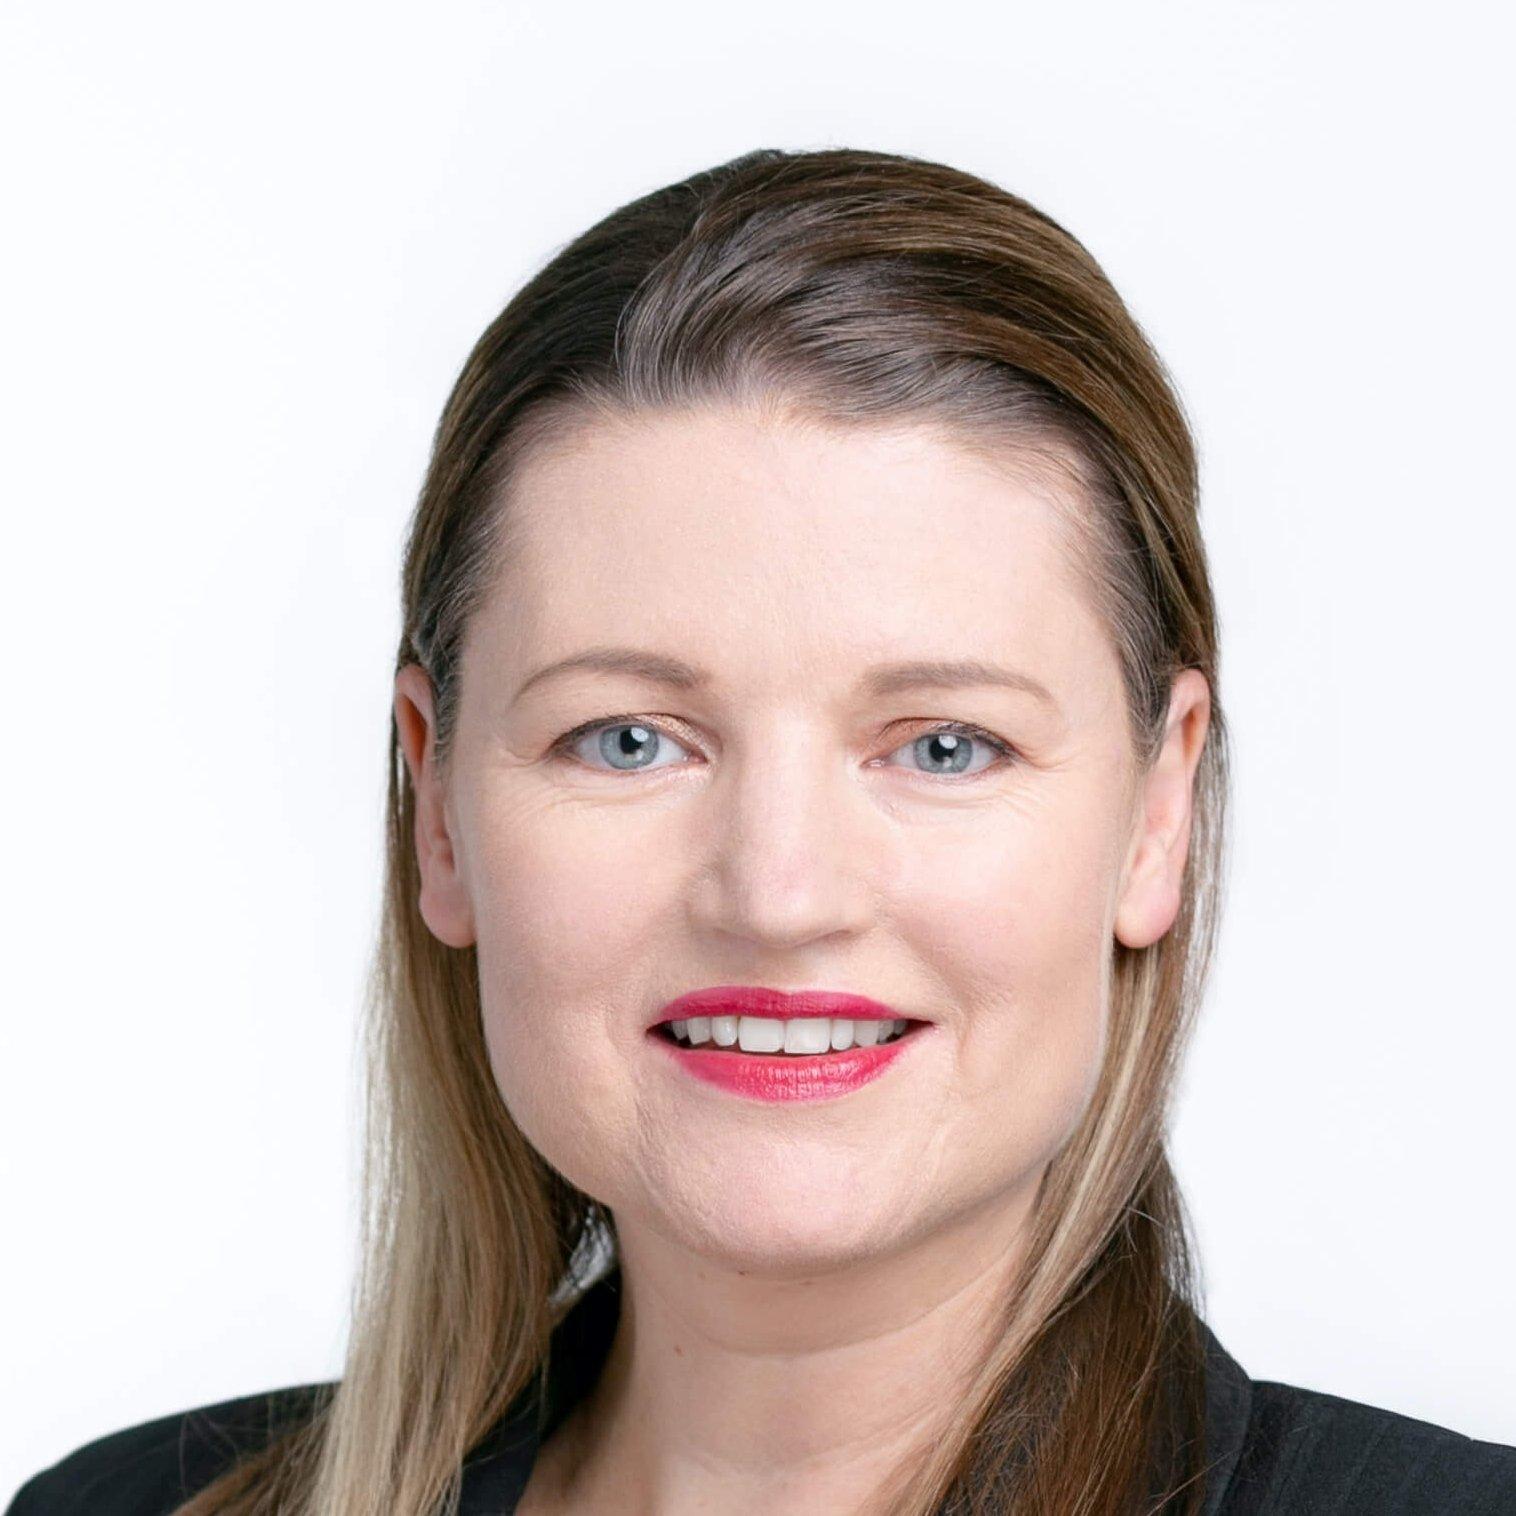 Pamela Moriarty